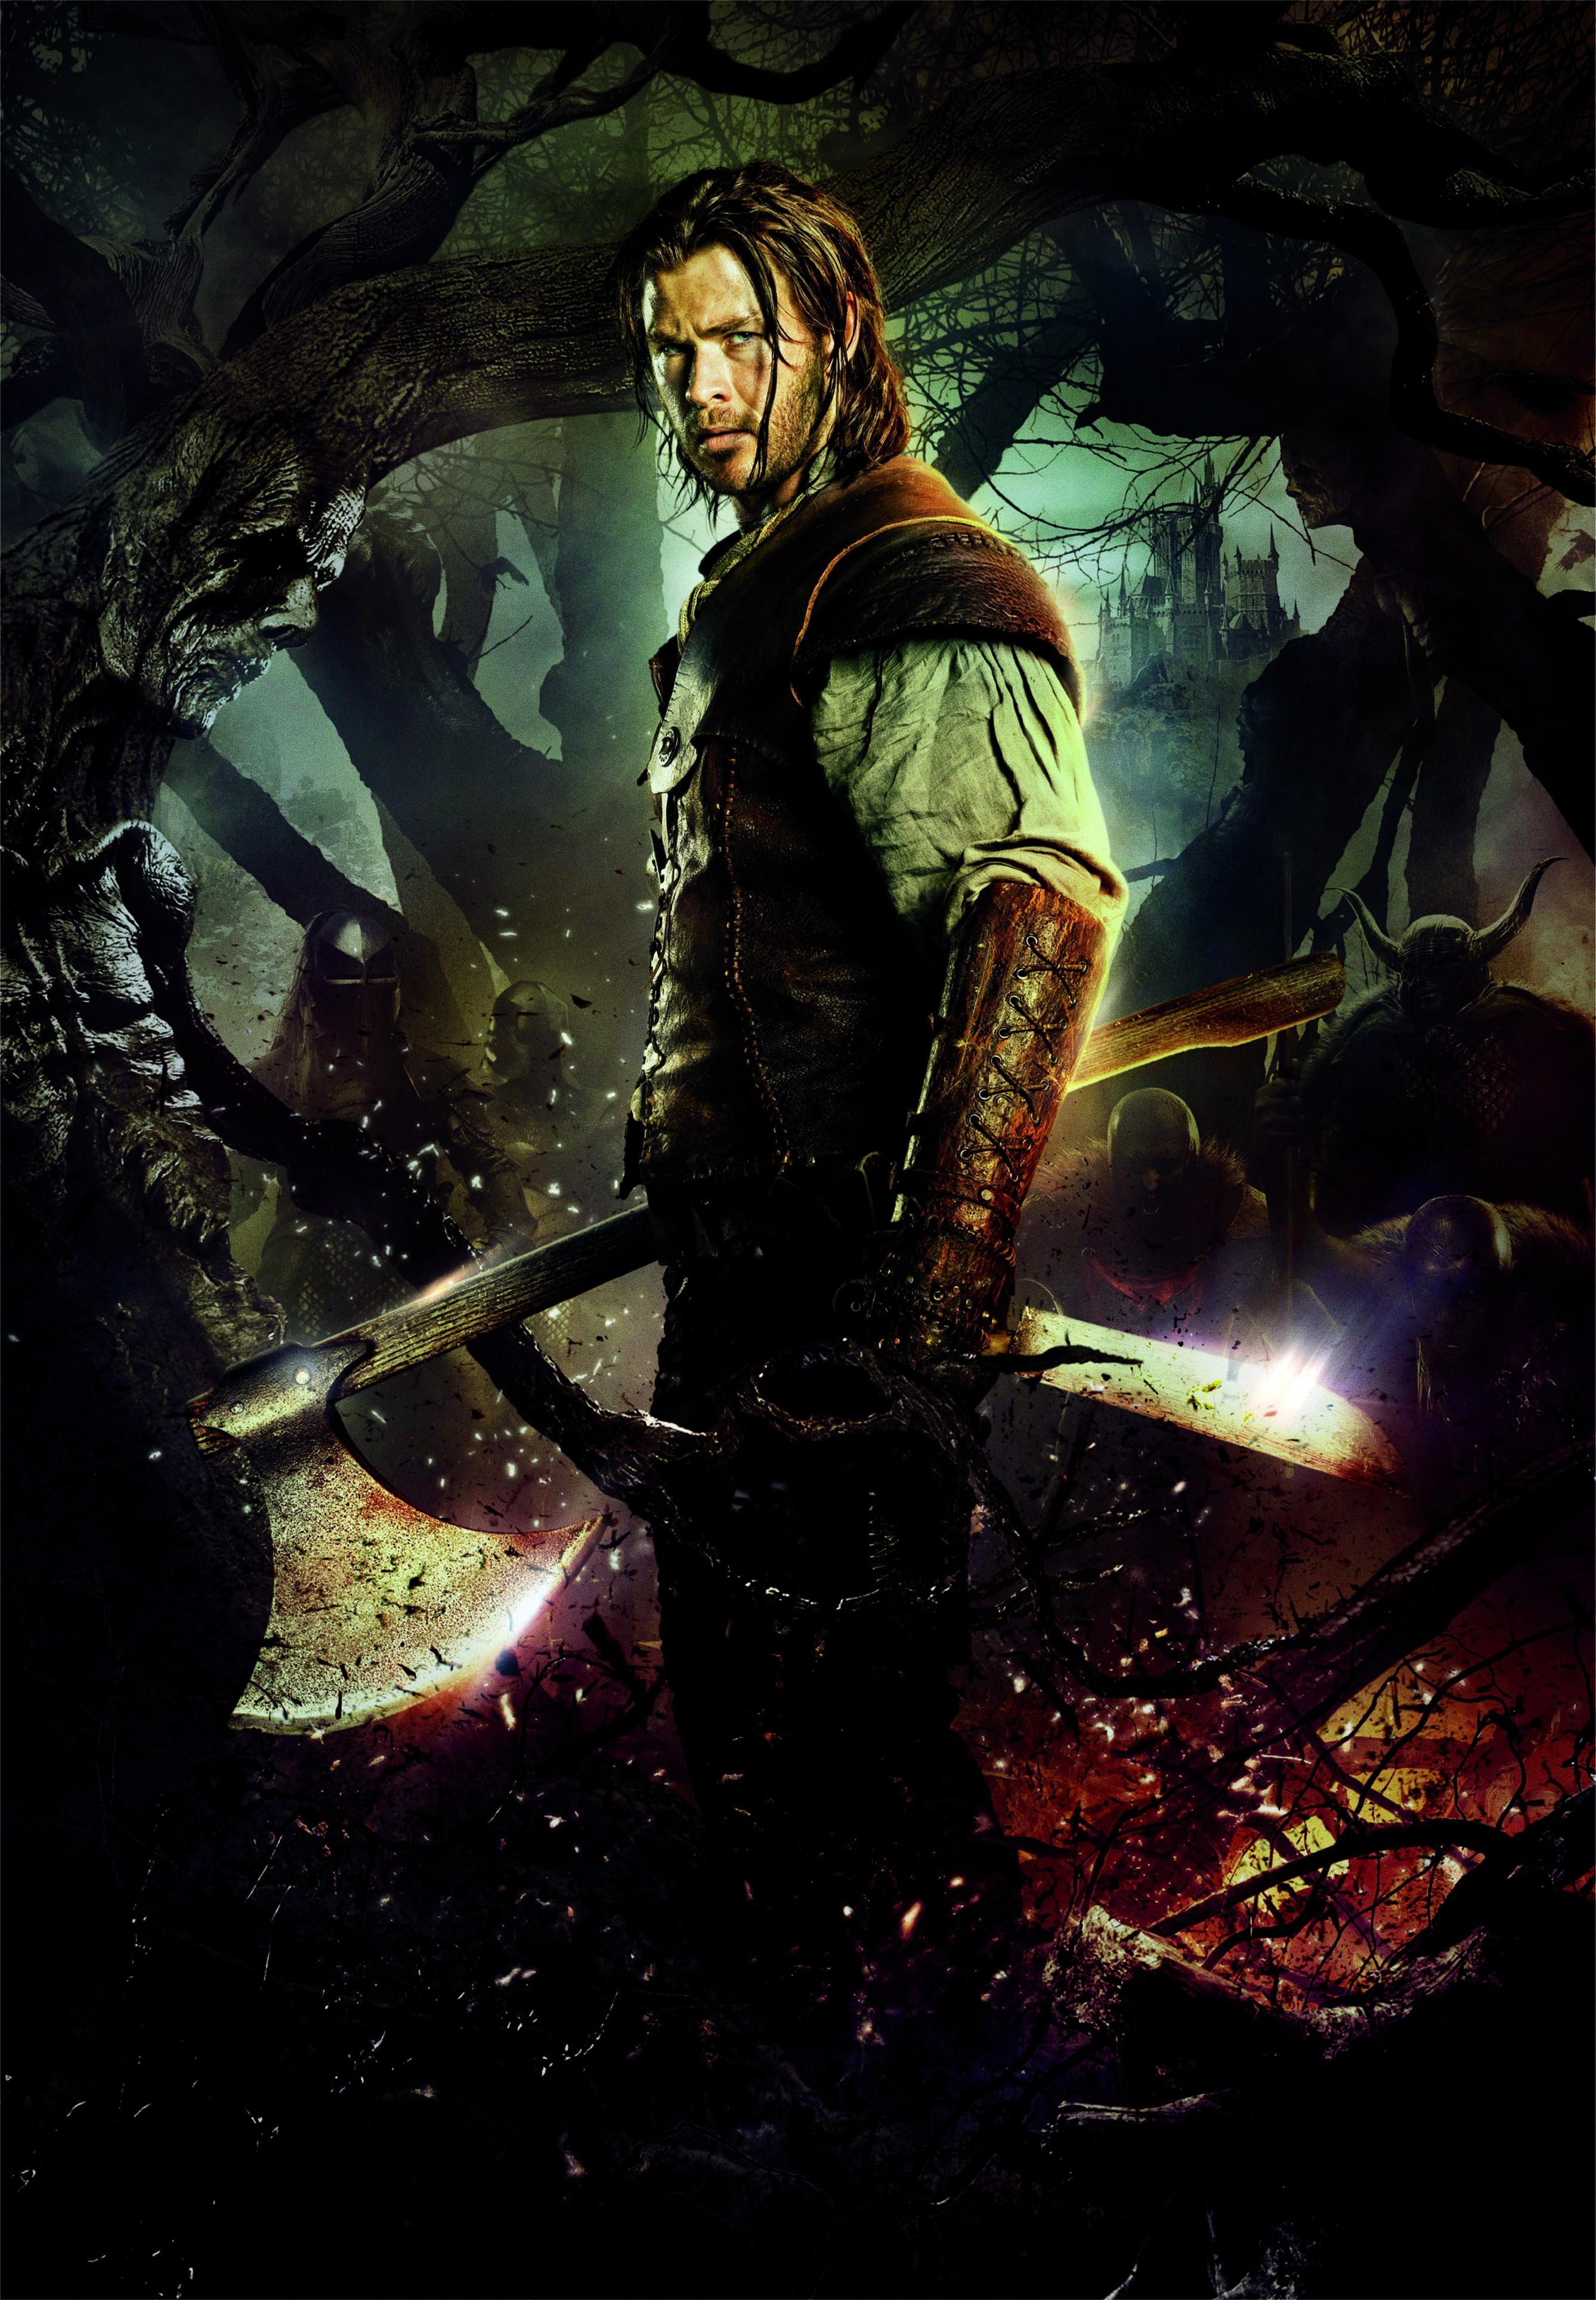 плакат фильма характер-постер textless Белоснежка и охотник